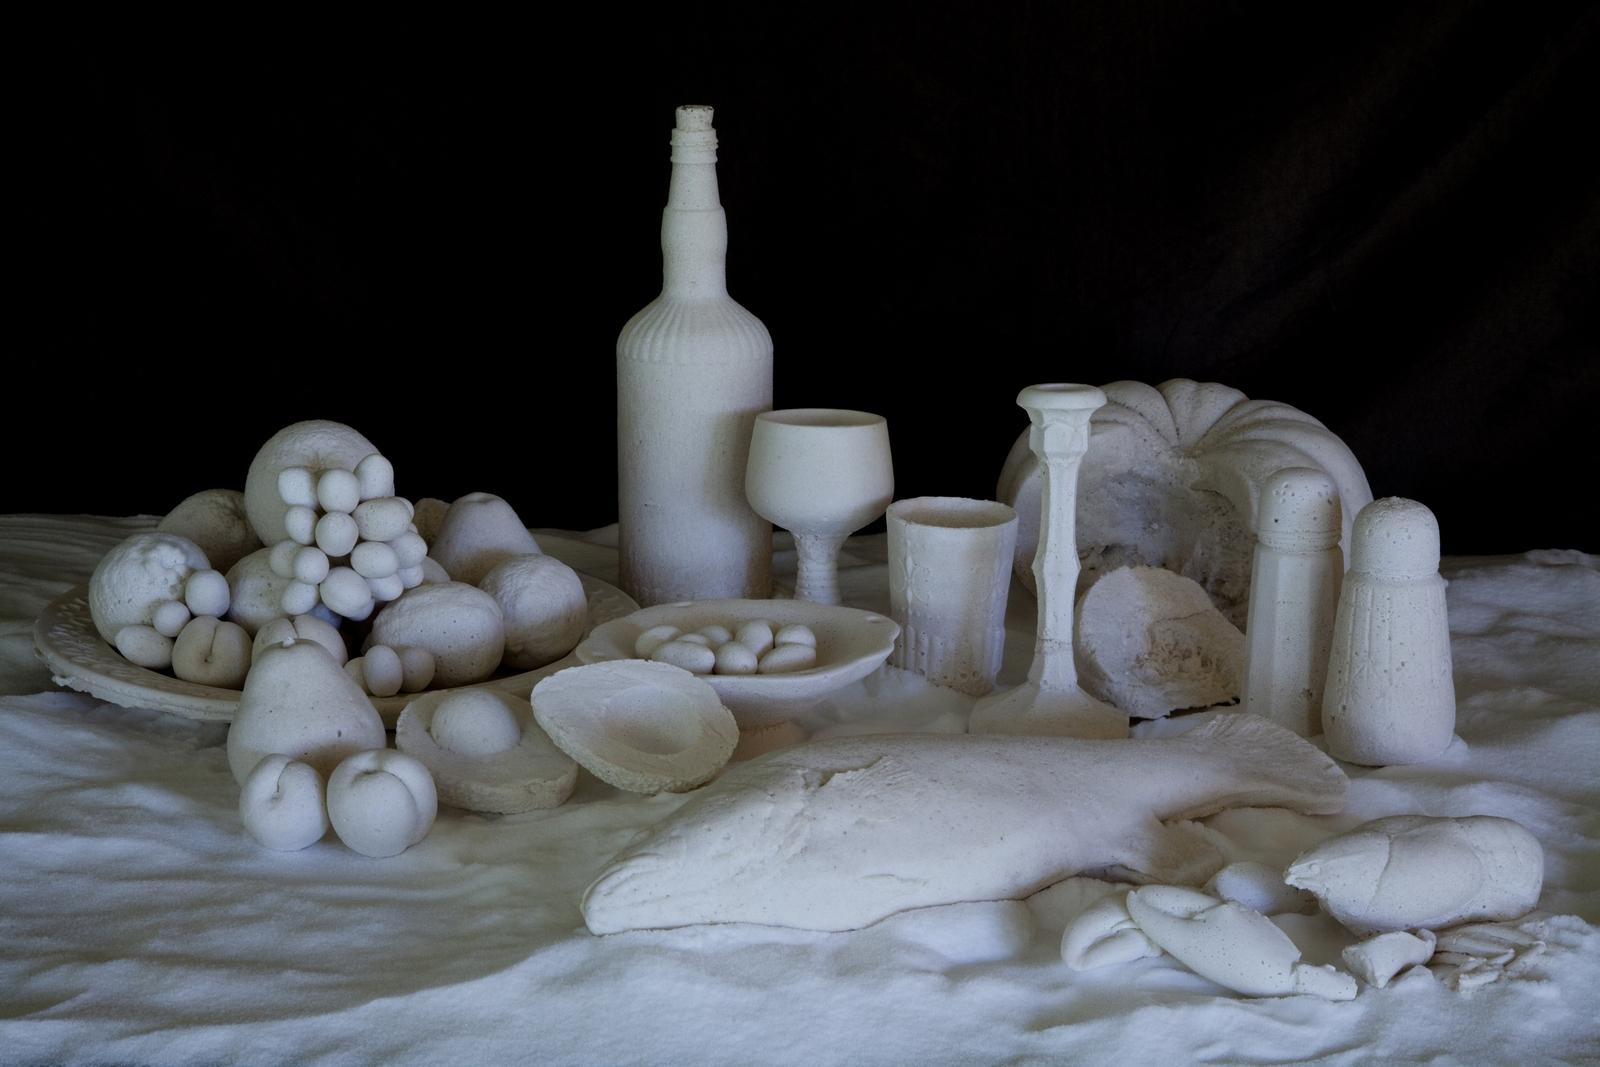 Ken+Julia Yonetani, Still Life: The Food Bowl image